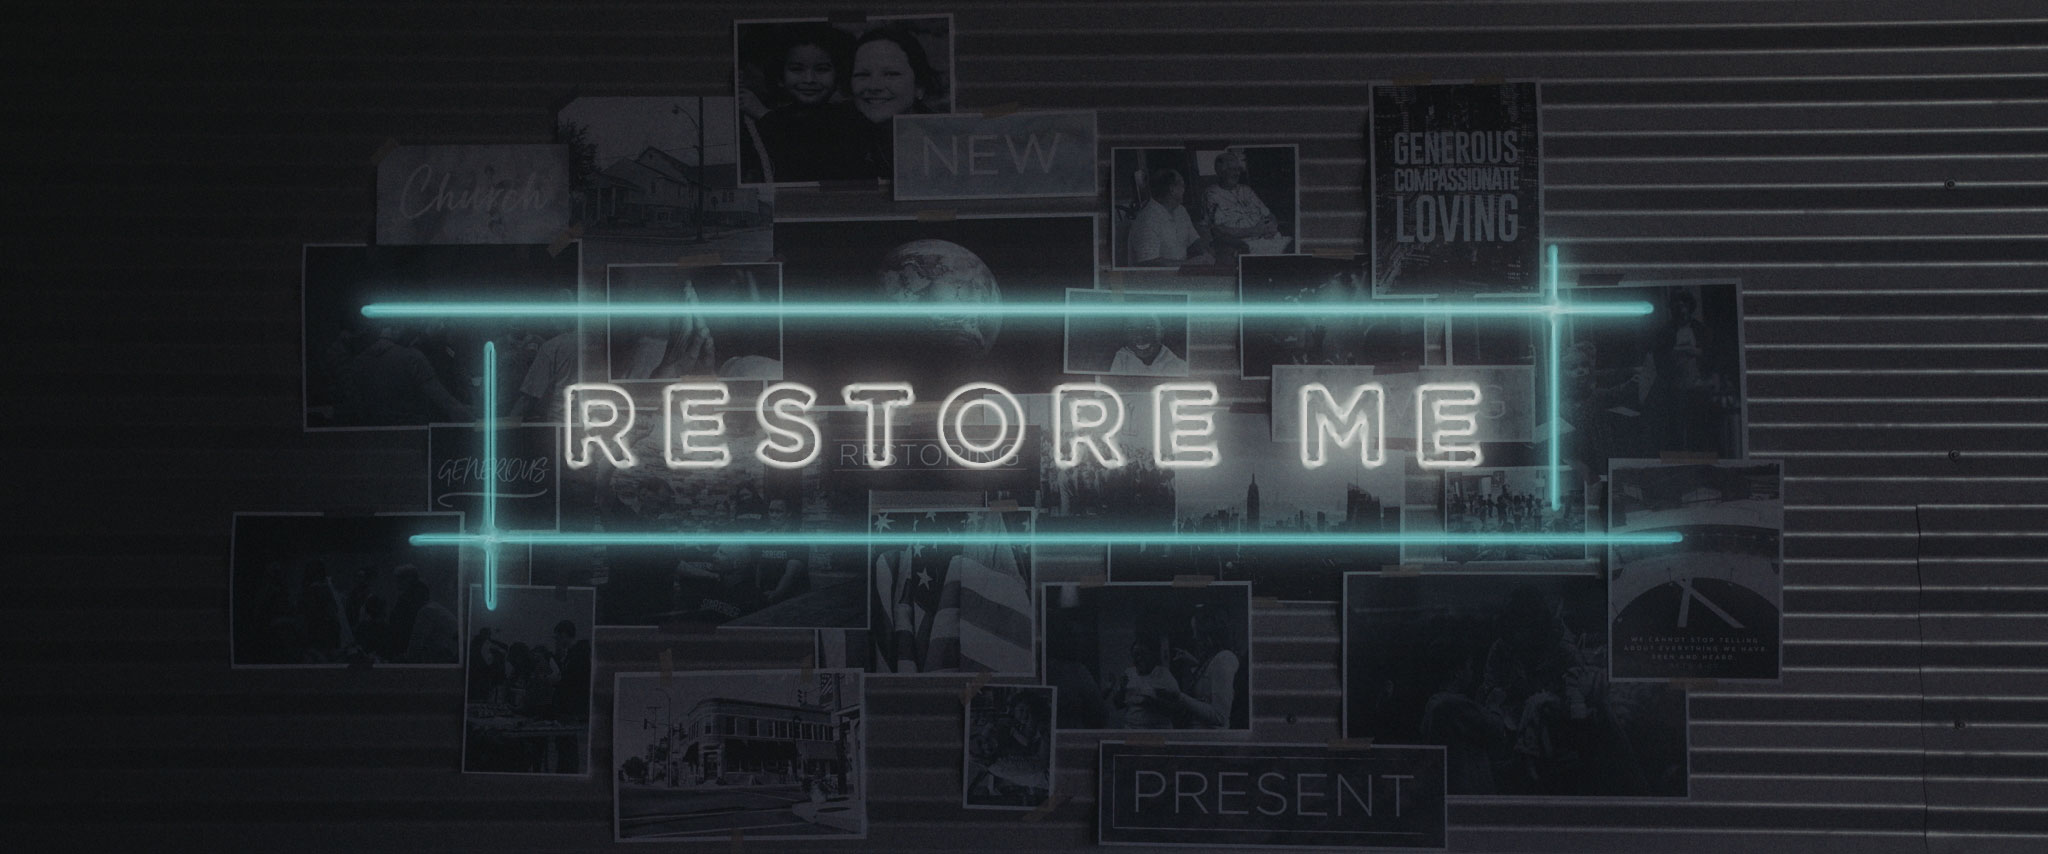 RESTORE_ME_WEB_13.jpg